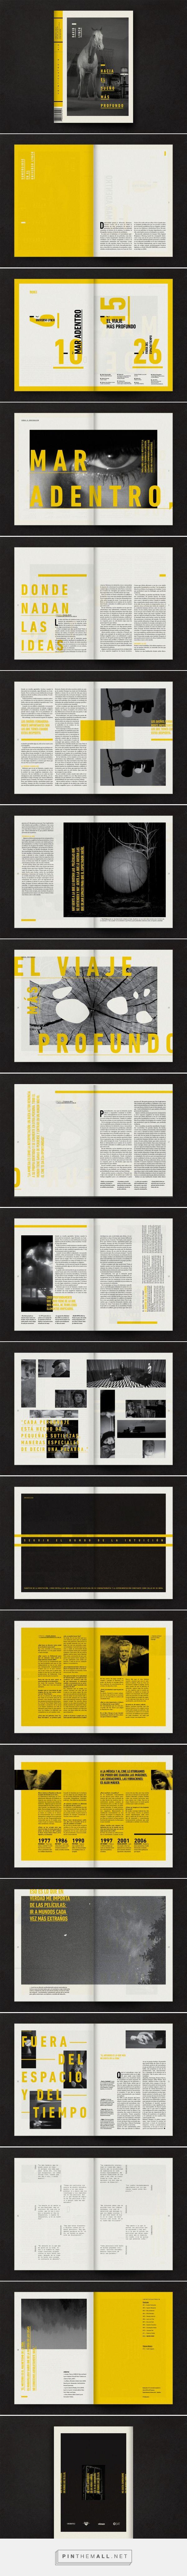 Editorial / David Lynch by Juan Pablo Dellacha